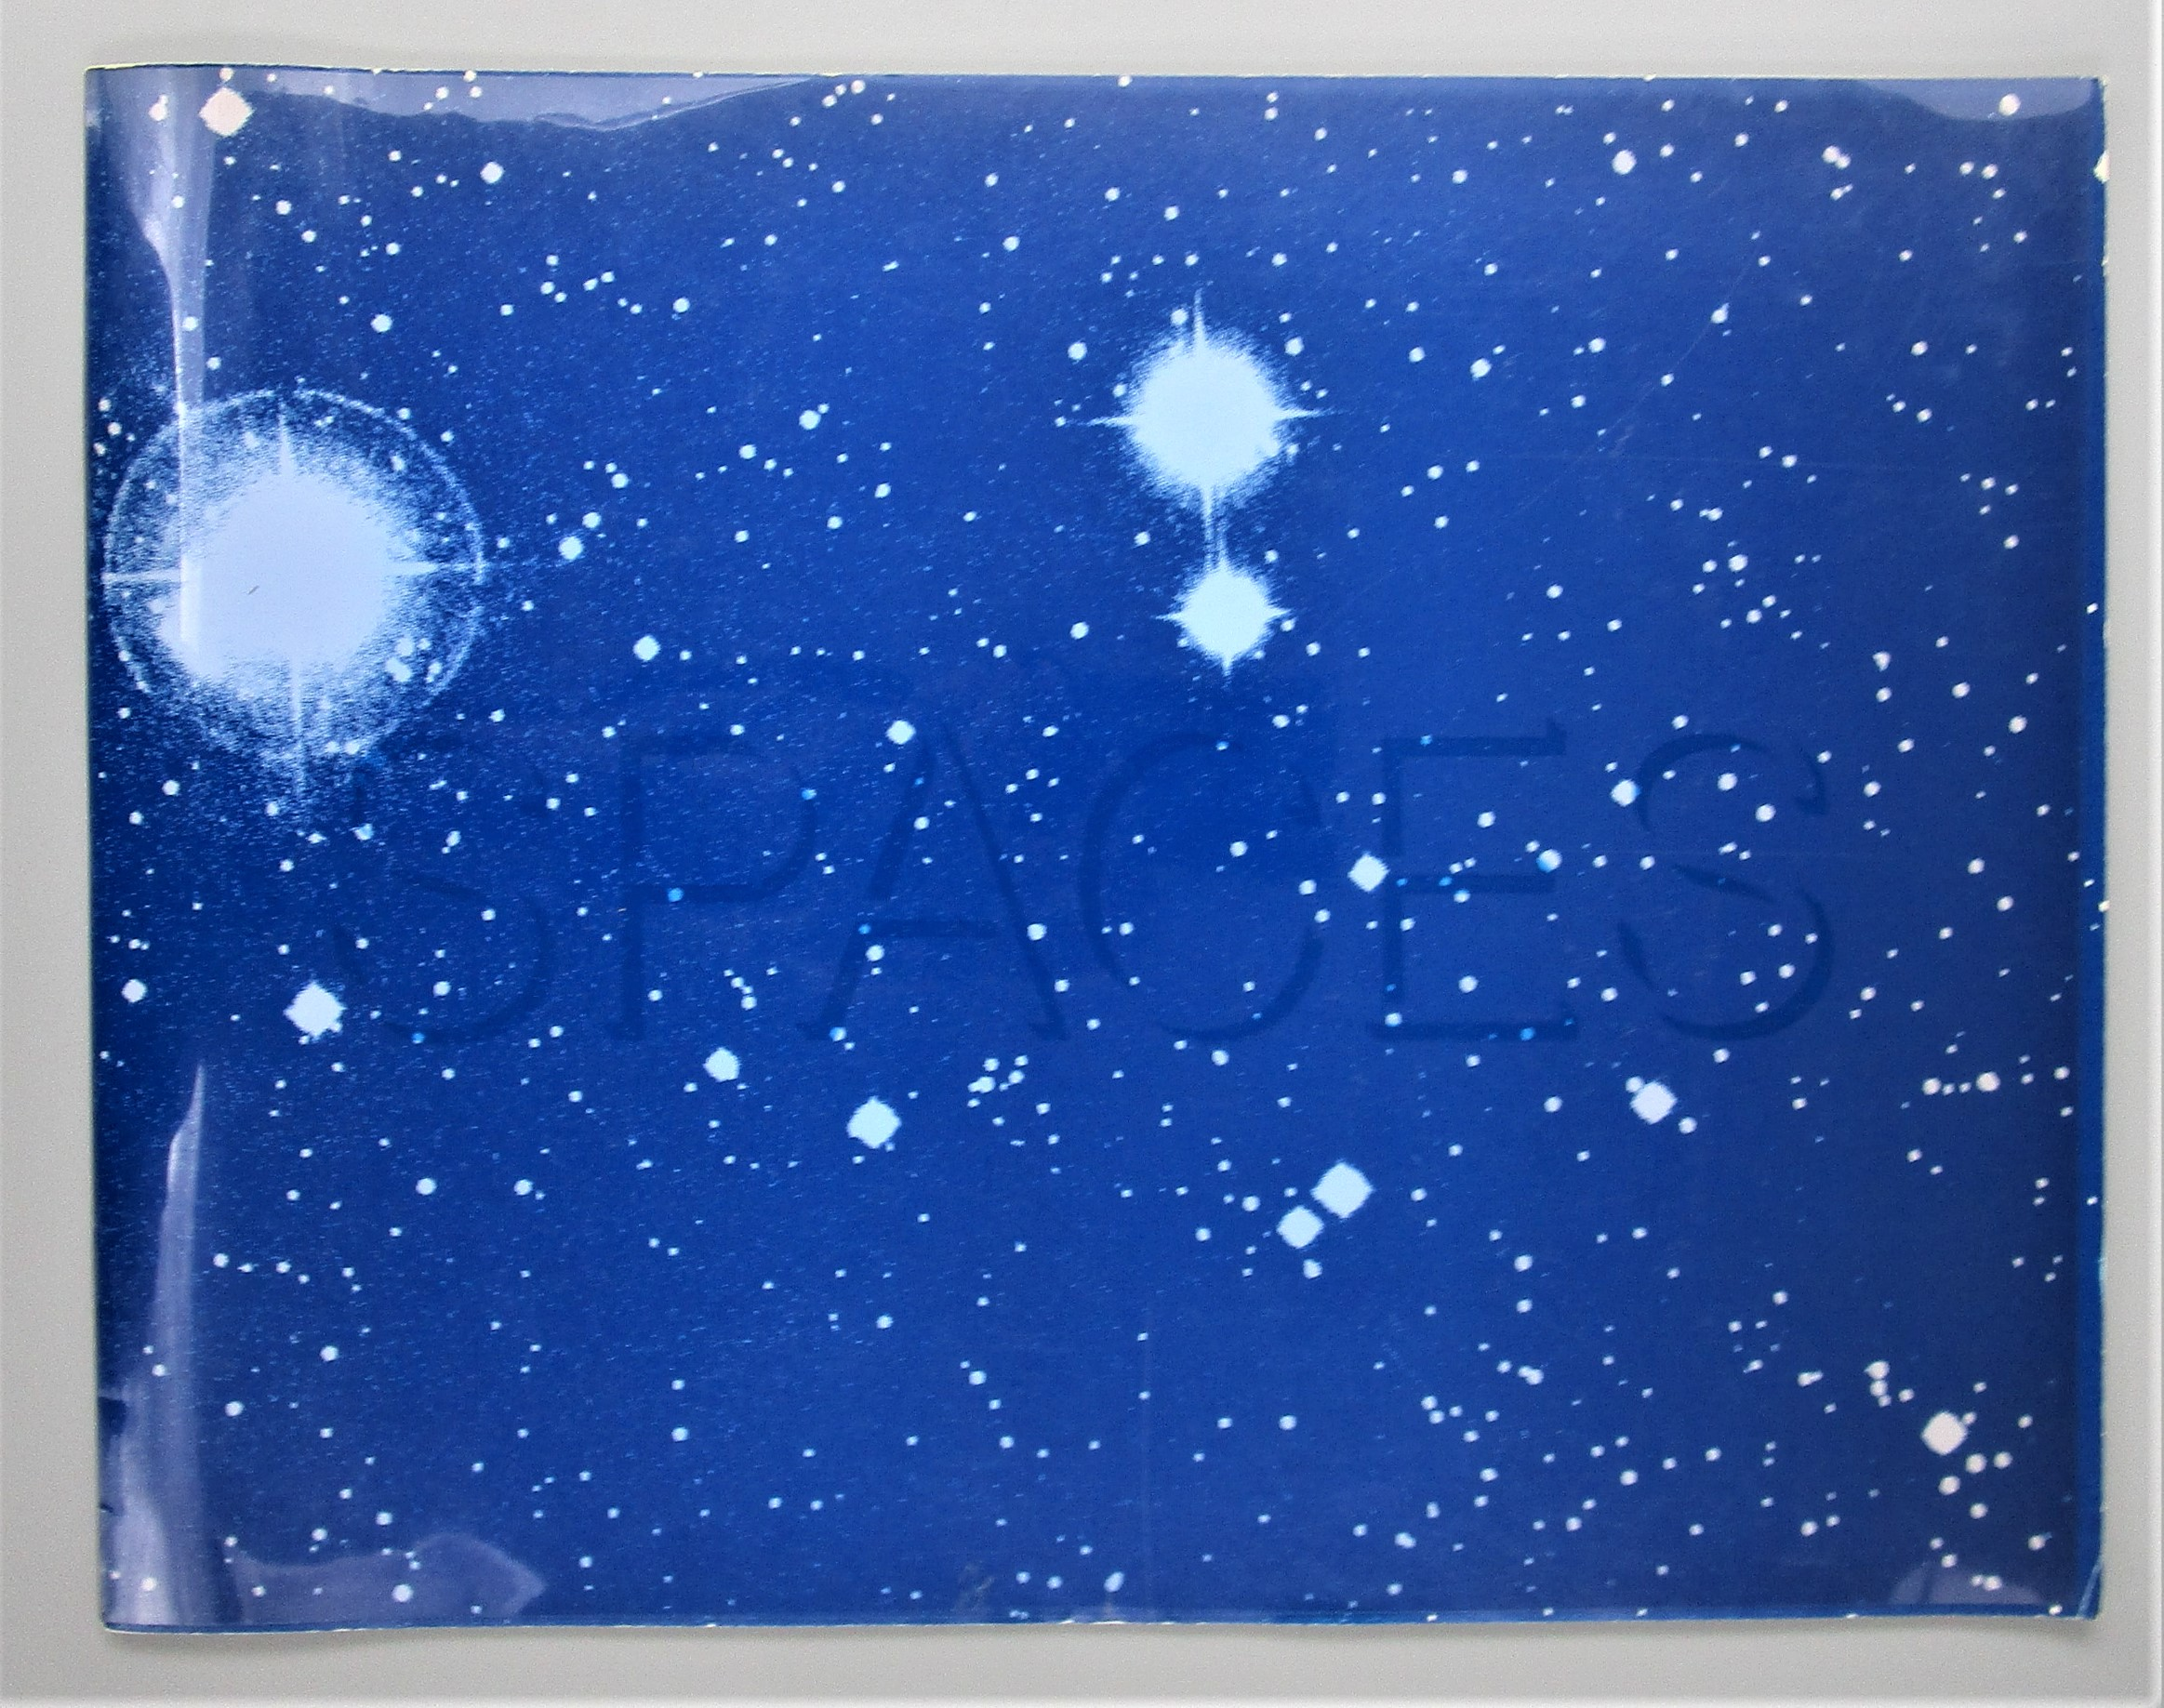 SPACES, by Jennifer Licht - 1969